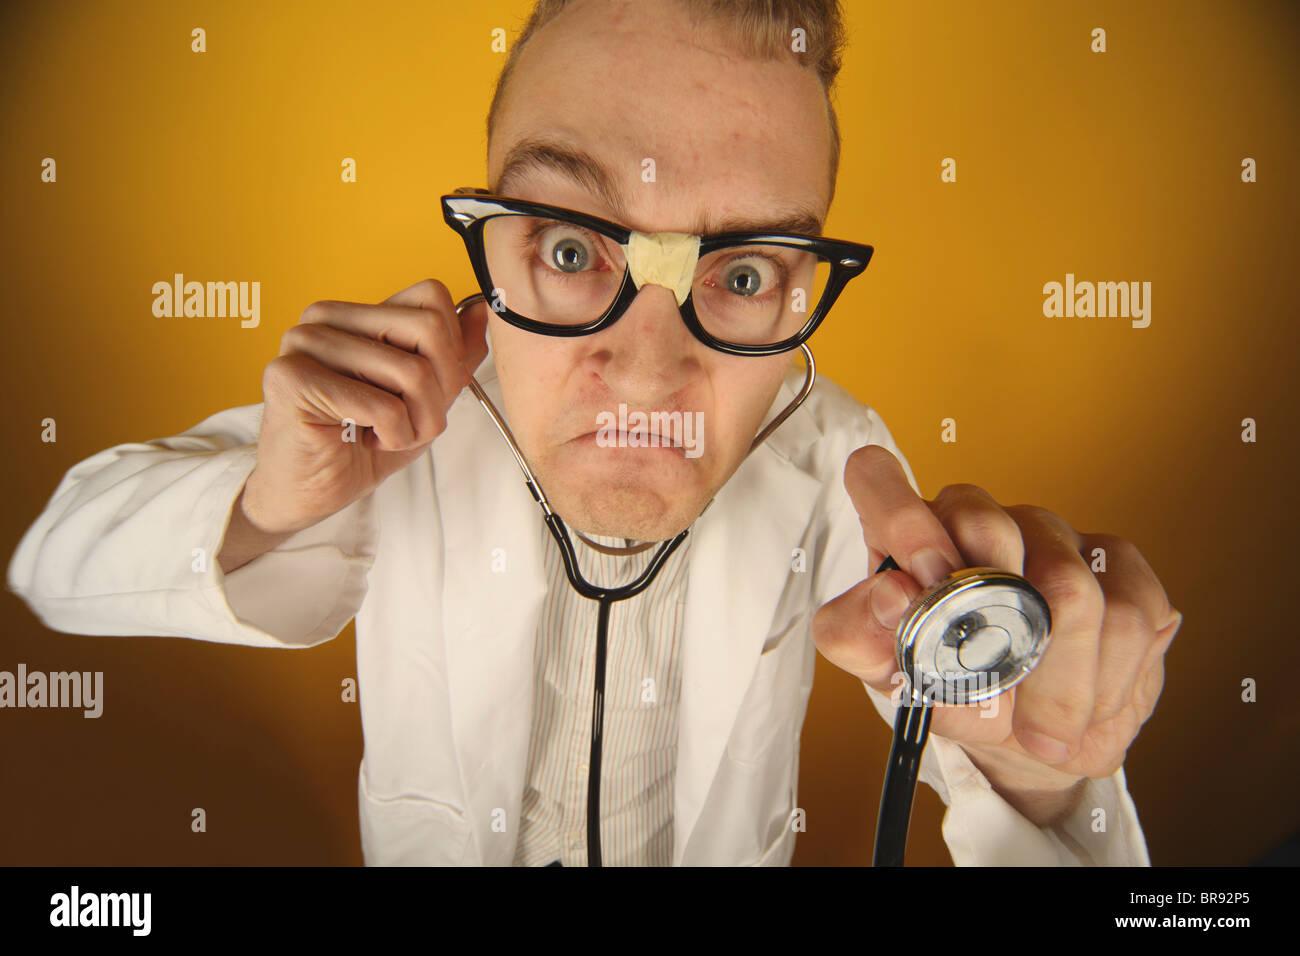 A Funny Doctor; Edmonton, Alberta, Canada - Stock Image